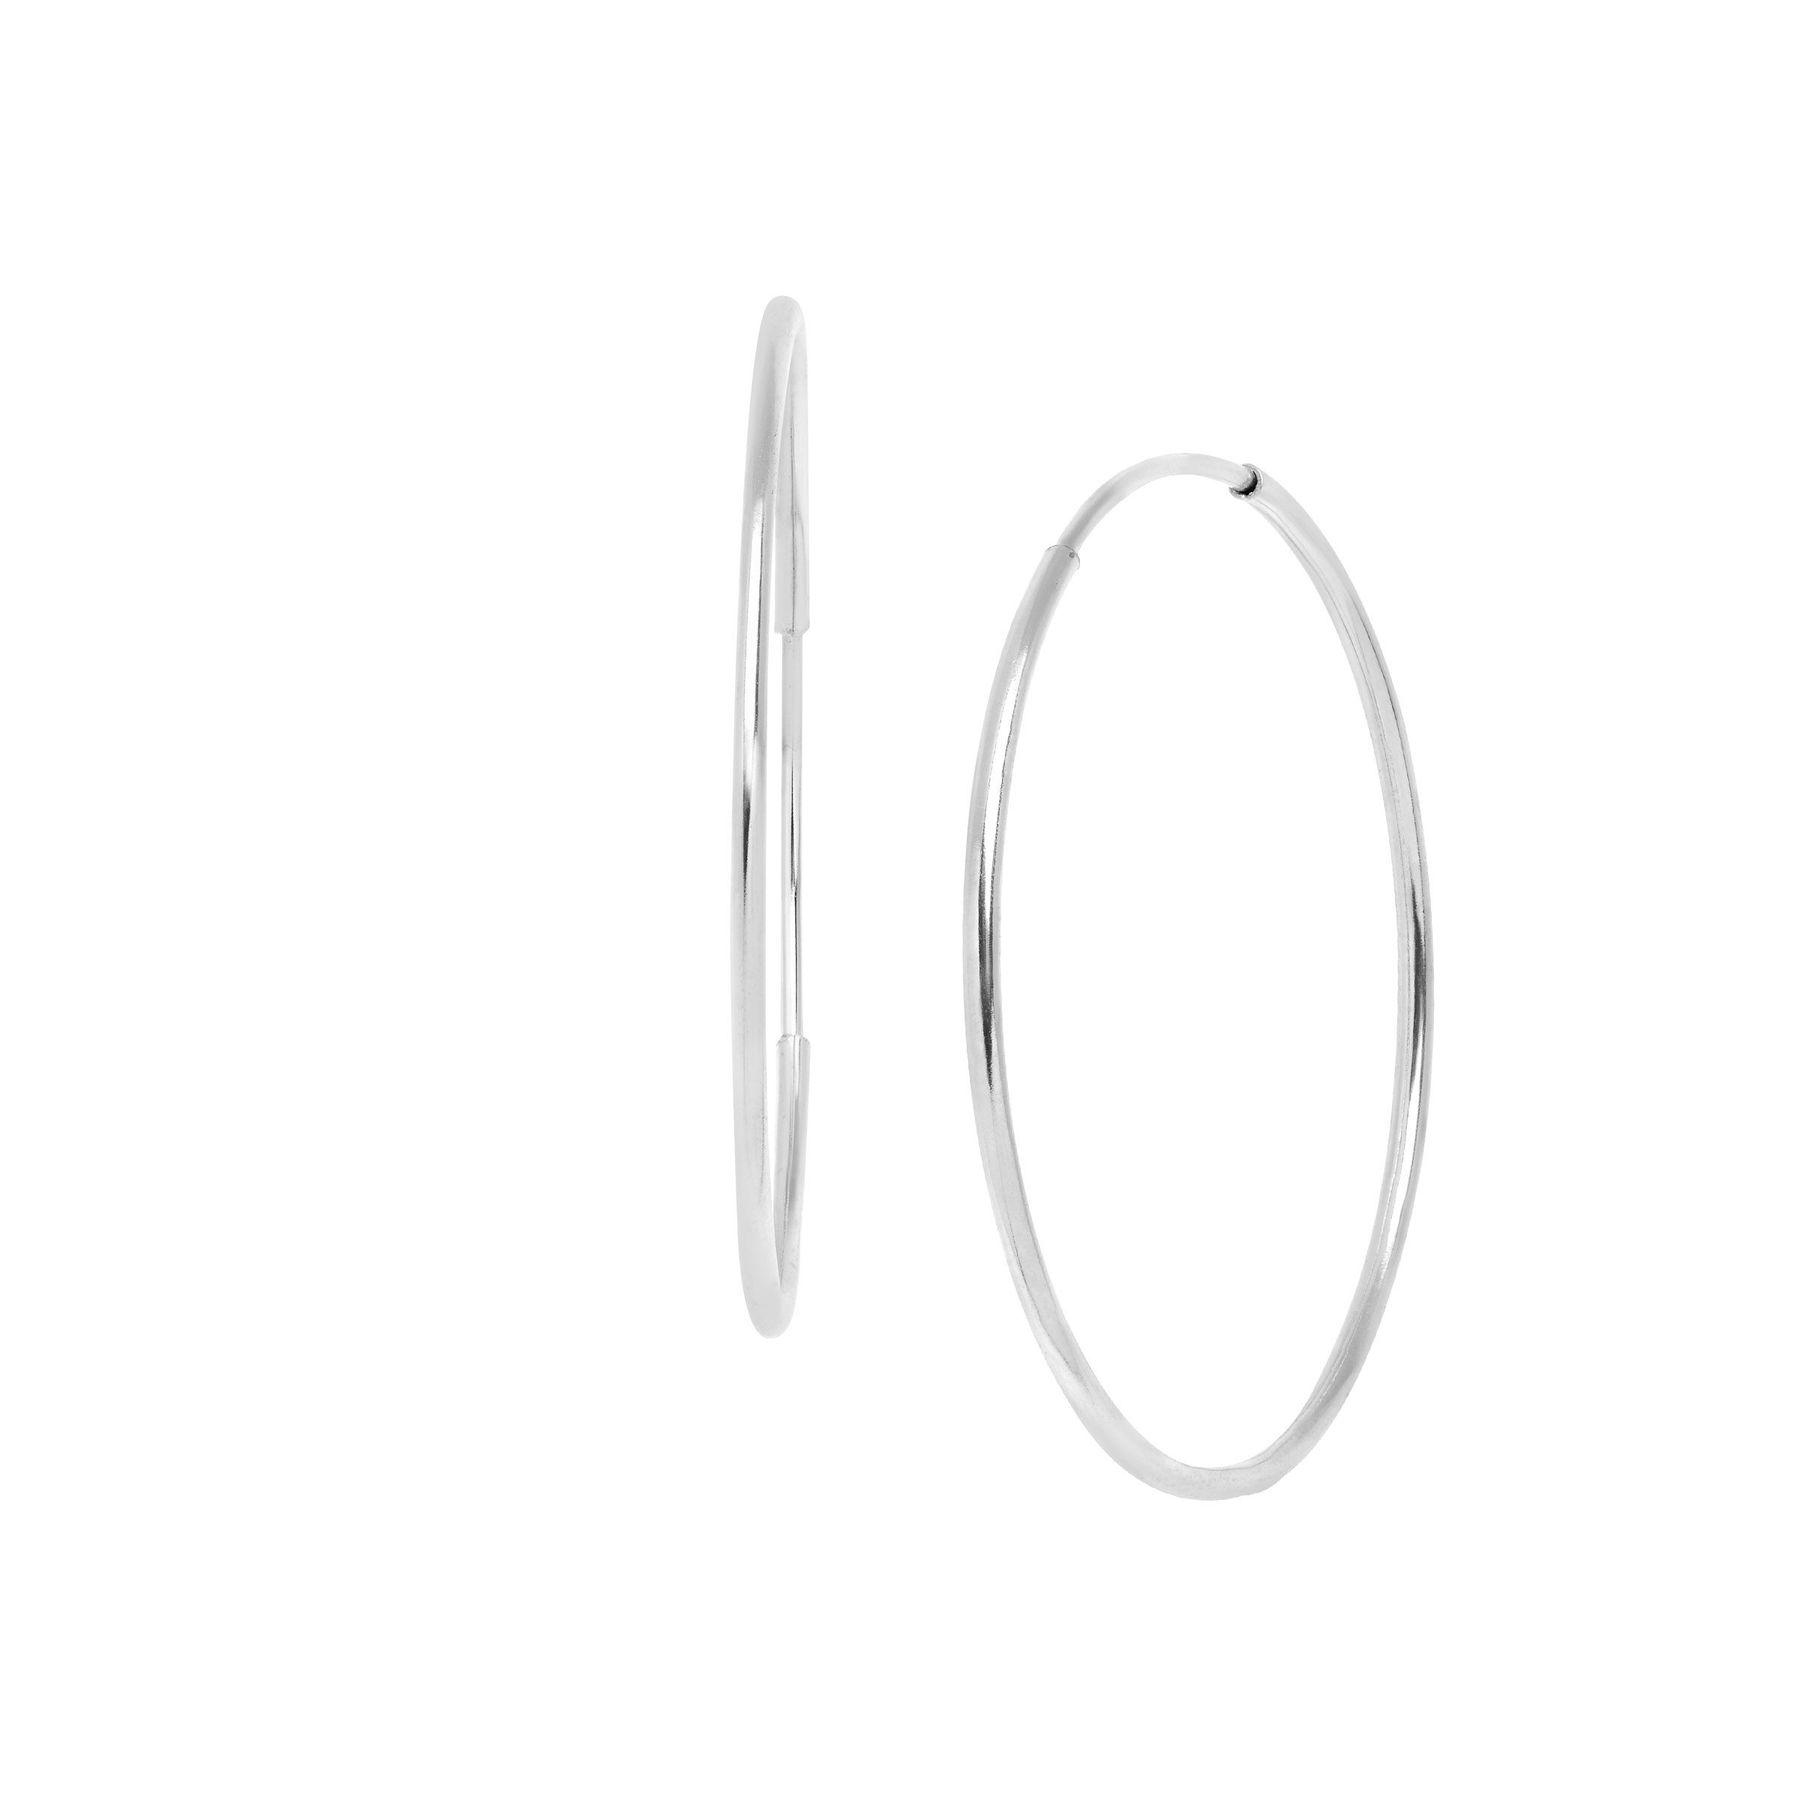 Eternity Gold Endless 14 Mm Hoop Earrings In 10k White